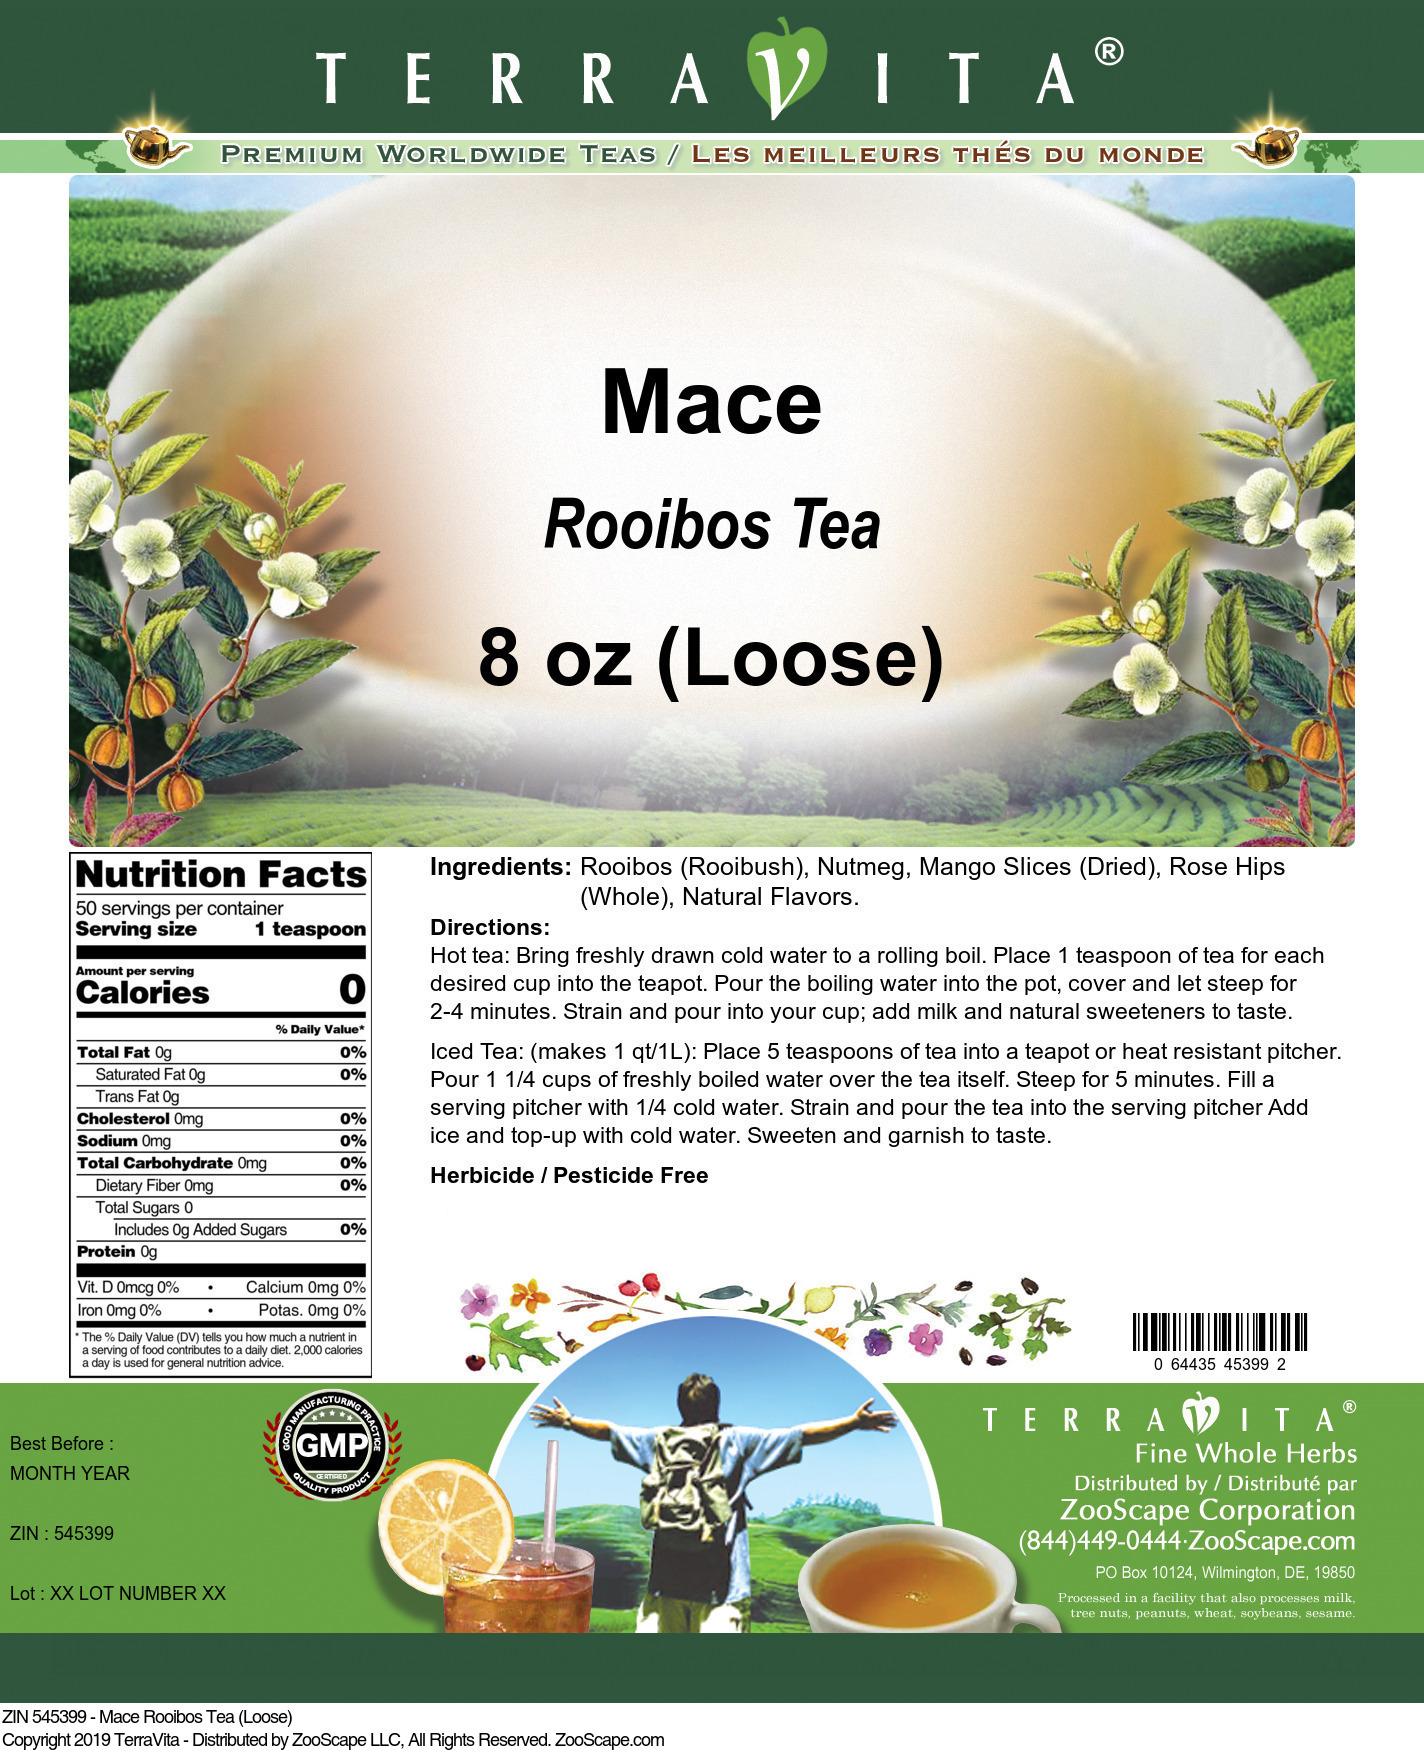 Mace Rooibos Tea (Loose)